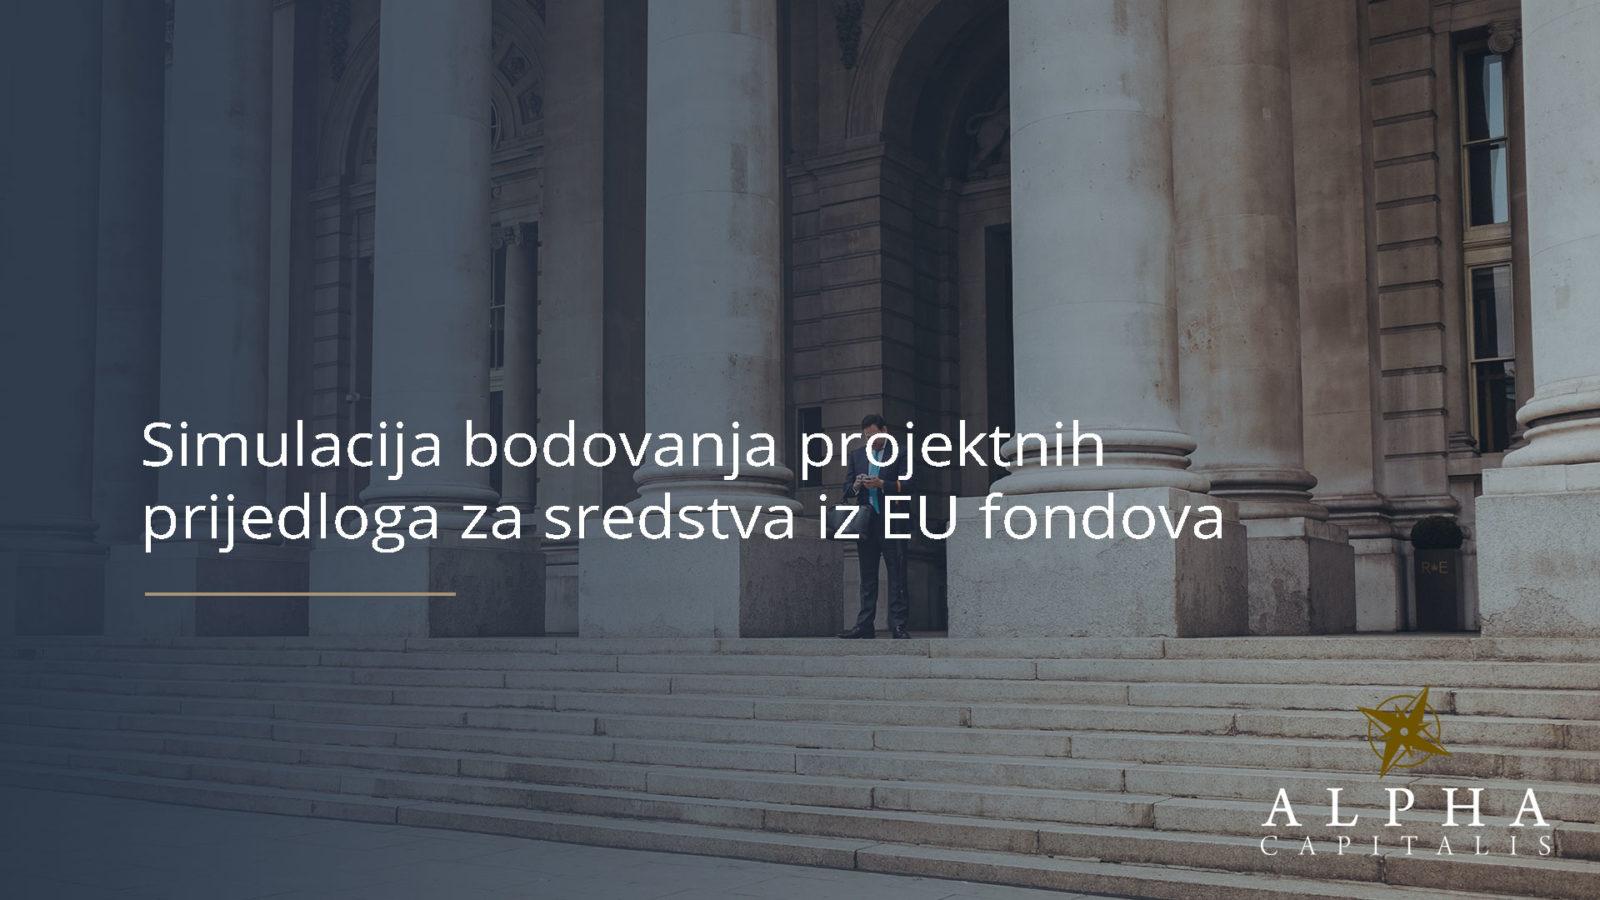 Simulacija bodovanja projektnih prijedloga za sredstva iz EU fondova - Simulacija bodovanja projektnih prijedloga za sredstva iz EU fondova